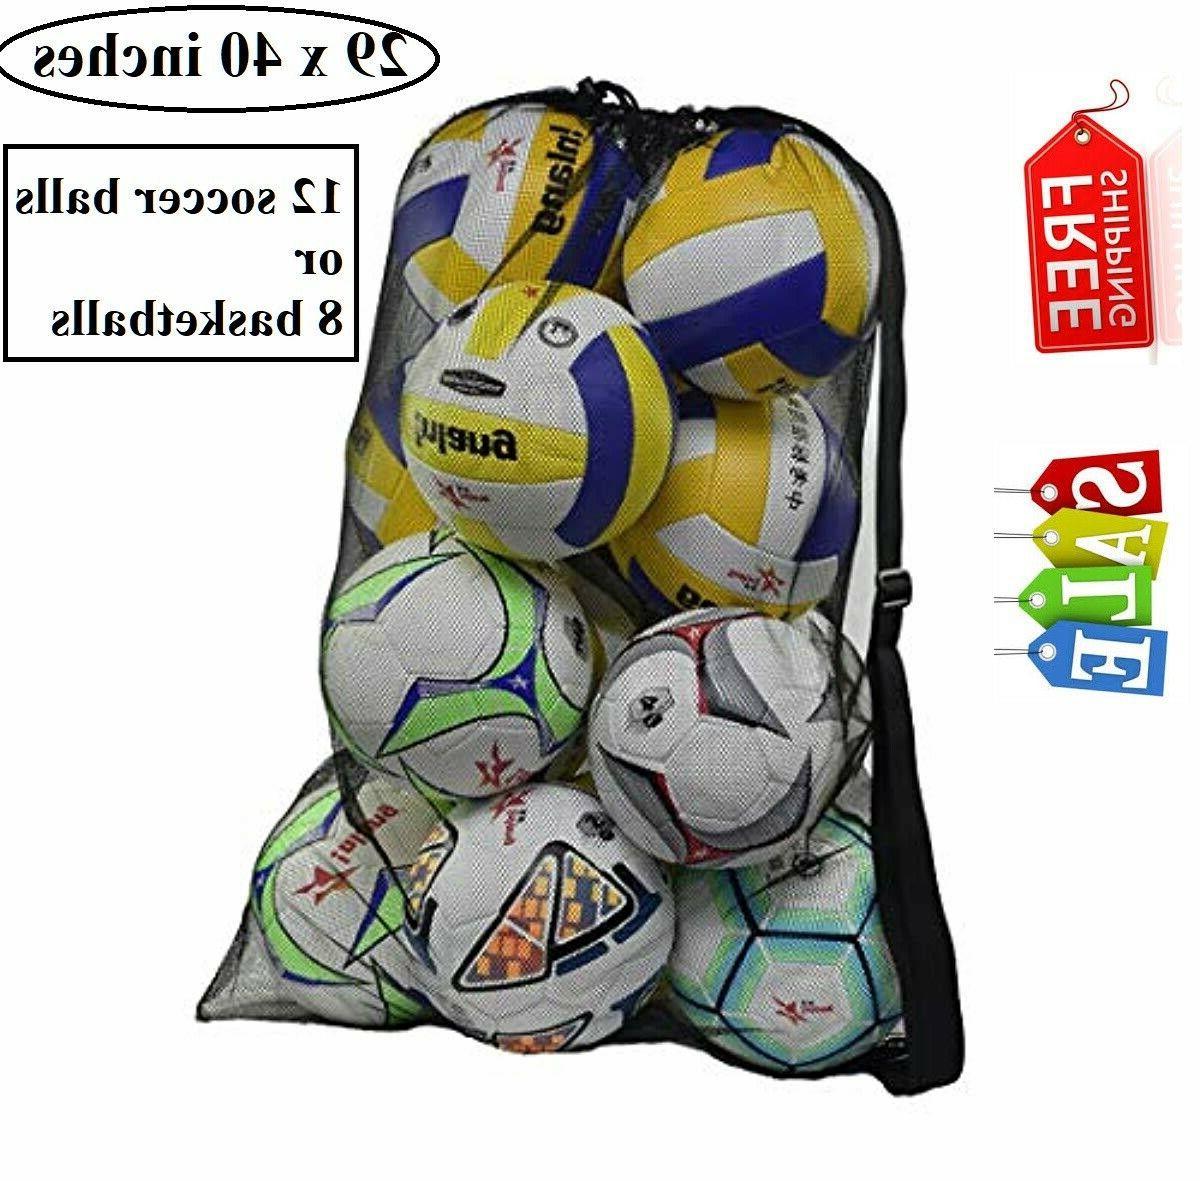 heavy duty mesh ball equipment bag soccer